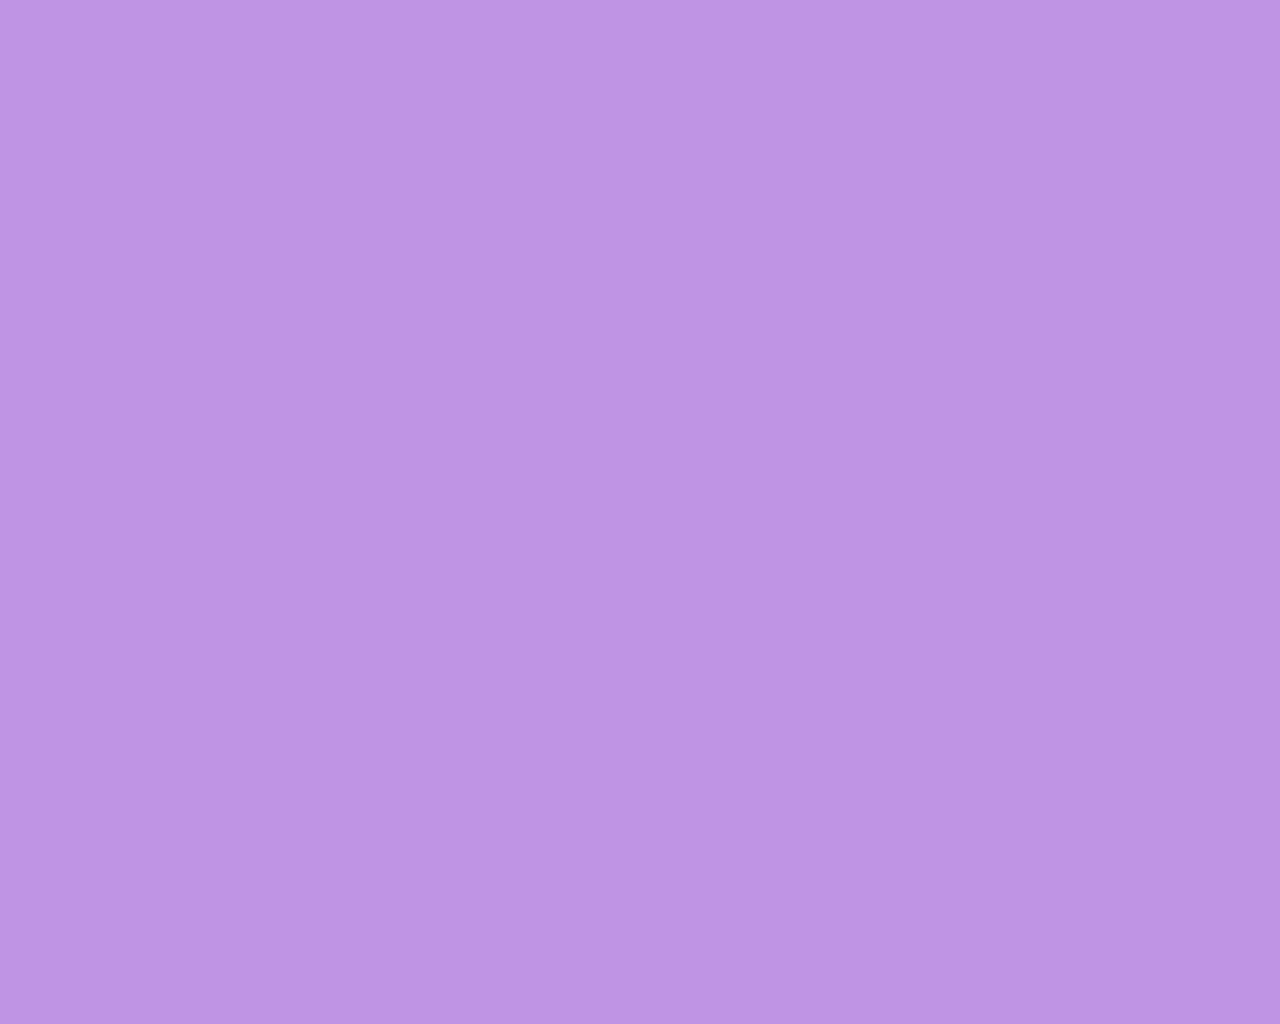 Lavender Backgrounds - Wallpaper Cave